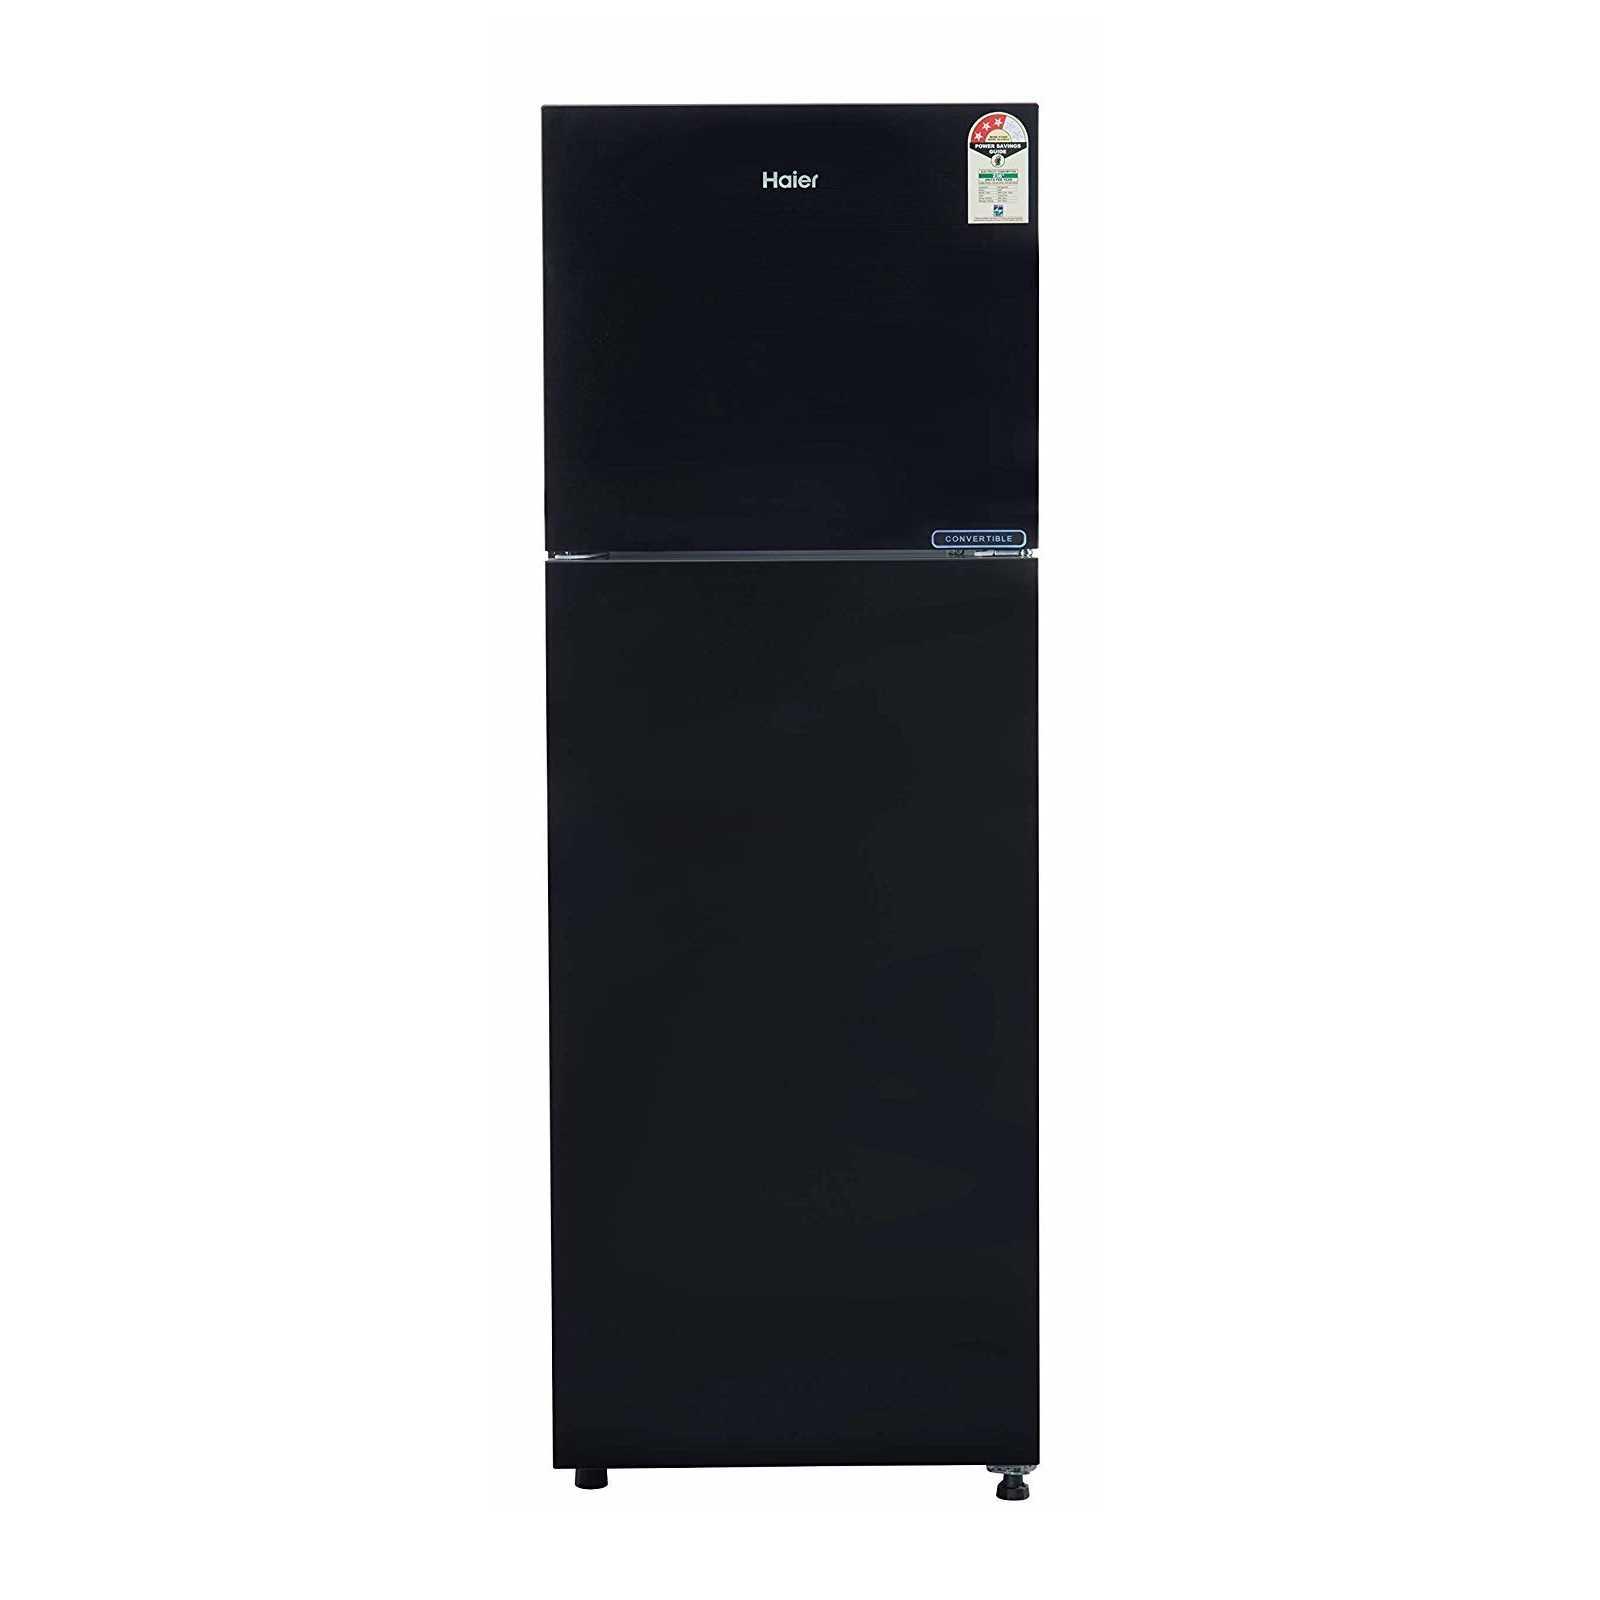 Haier HRF 2783CKG E 258 Litre Inverter Frost Free Double Door Refrigerator